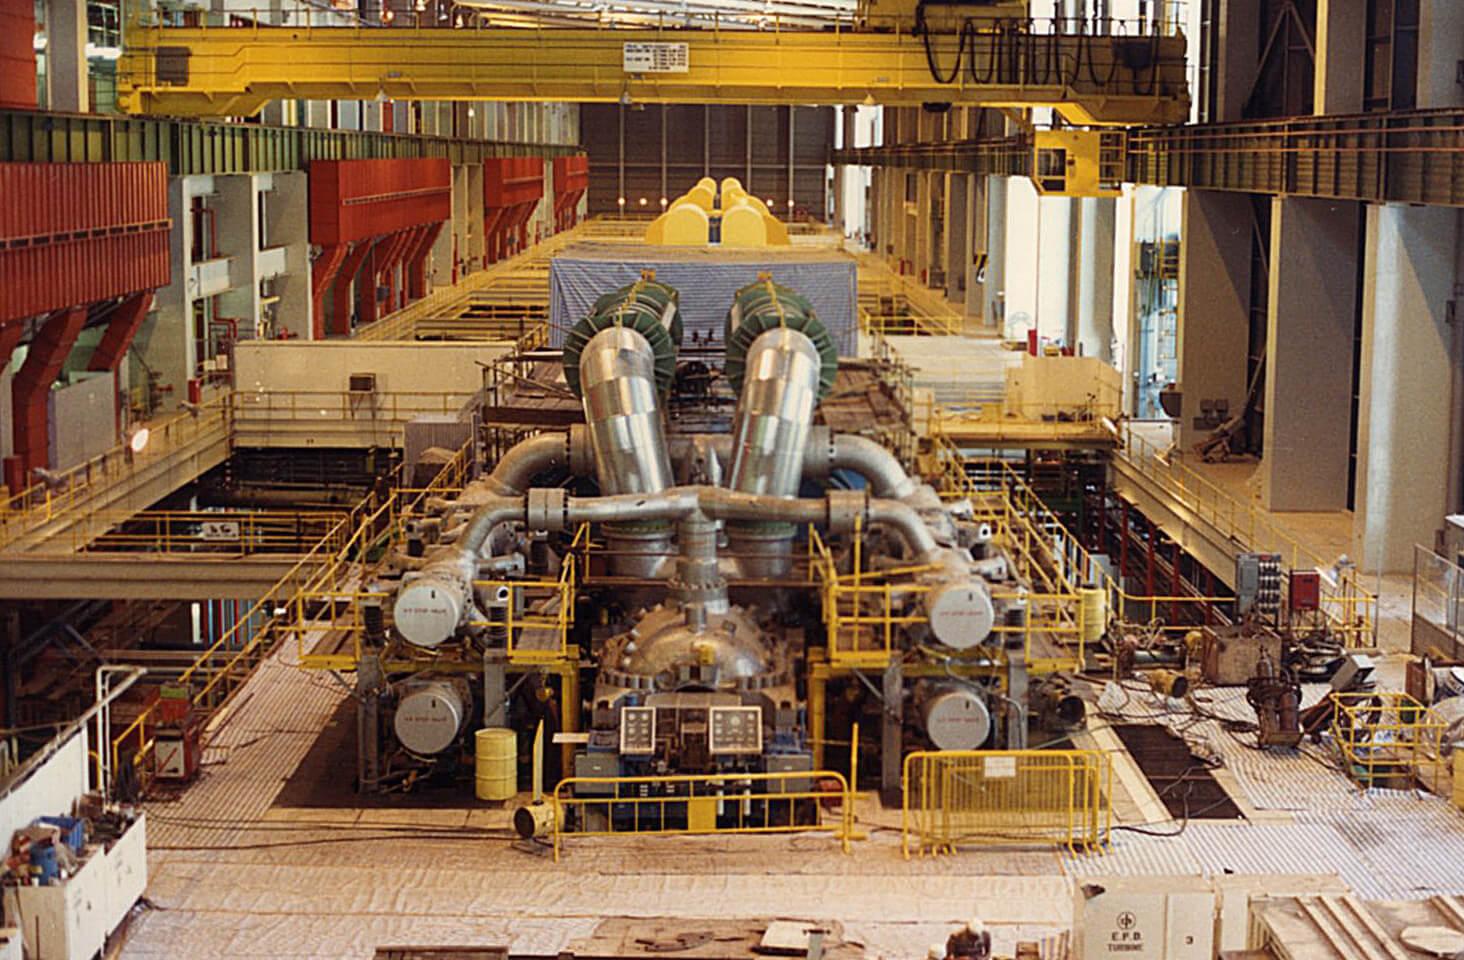 Castle Peak Power Station 'B'-Turbine Hall-003-Unit B4 turbine under construction 4